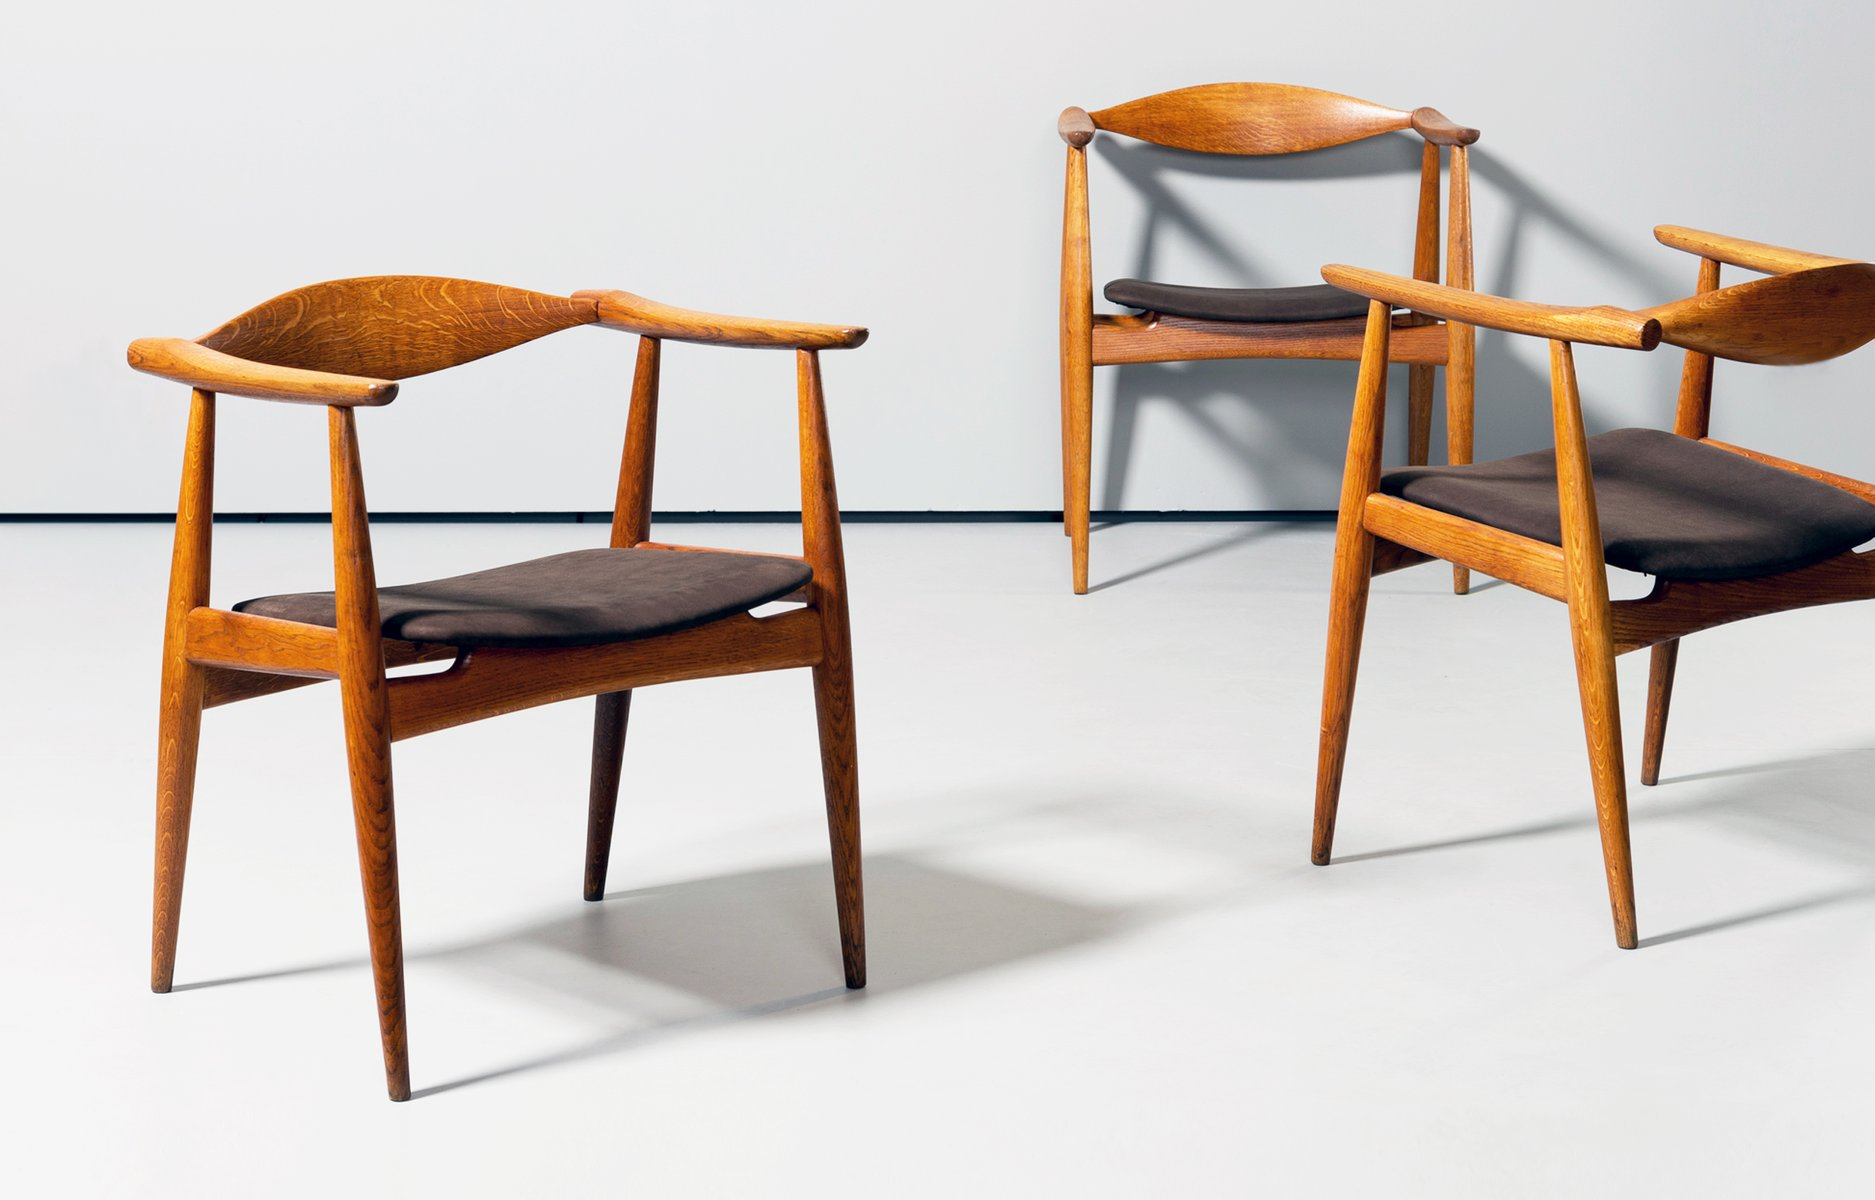 carl hansen chairs. CH35 Dining Chairs By Hans J. Wegner For Carl Hansen, 1960s, Set Of 6 Hansen